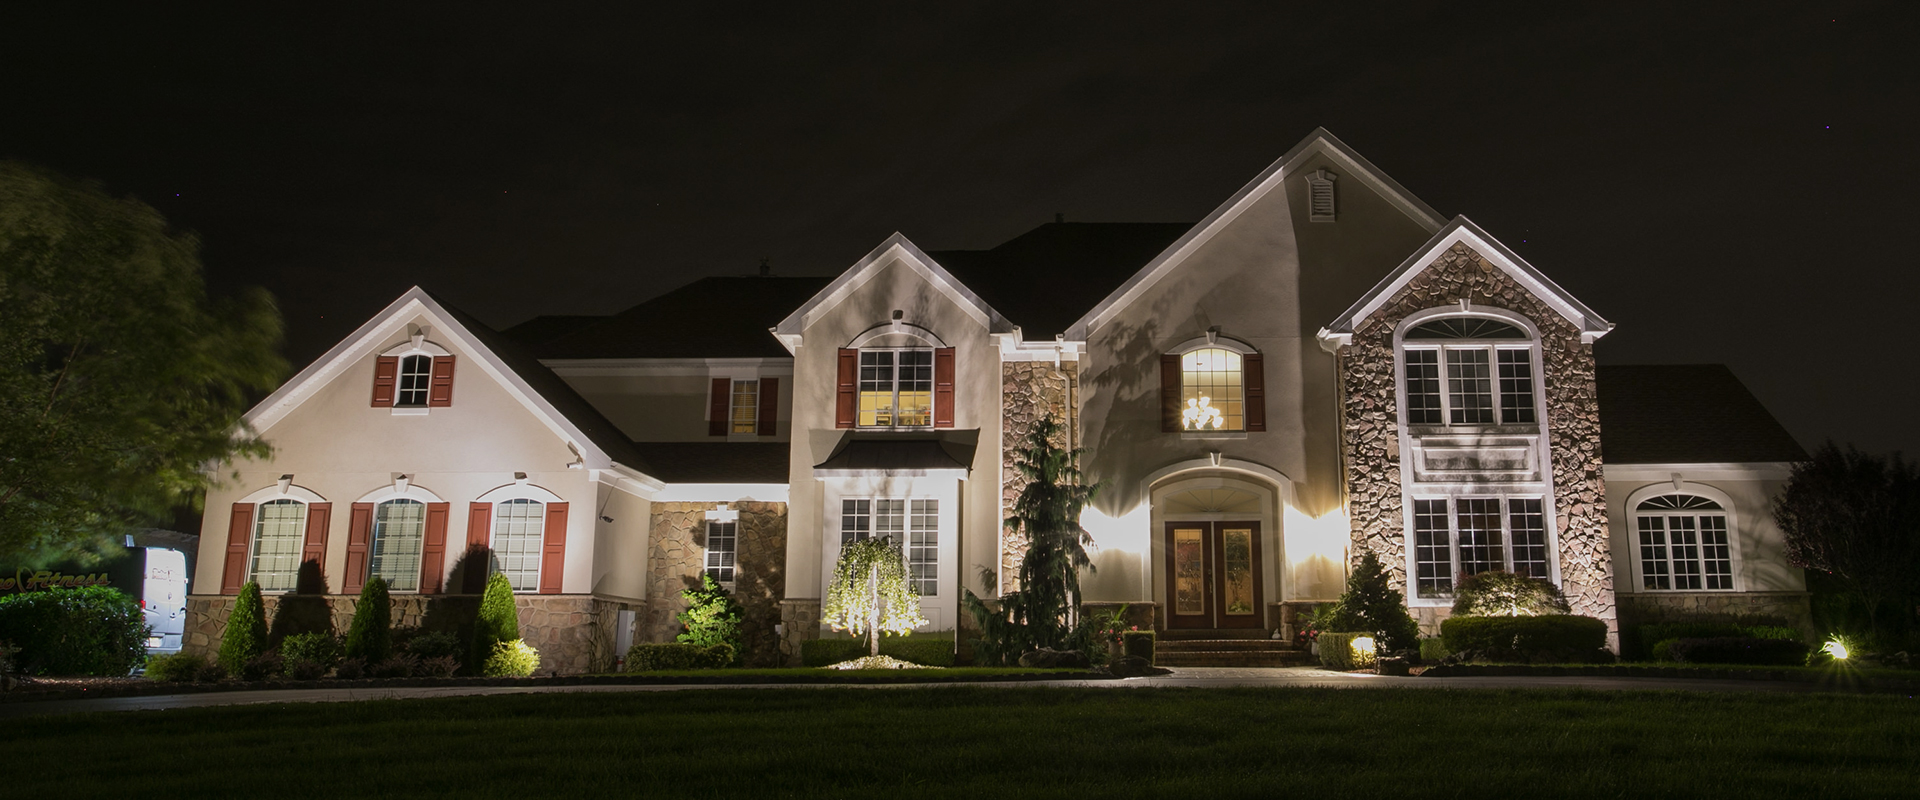 nightfall lighting custom outdoor lighting design philadelphia pa